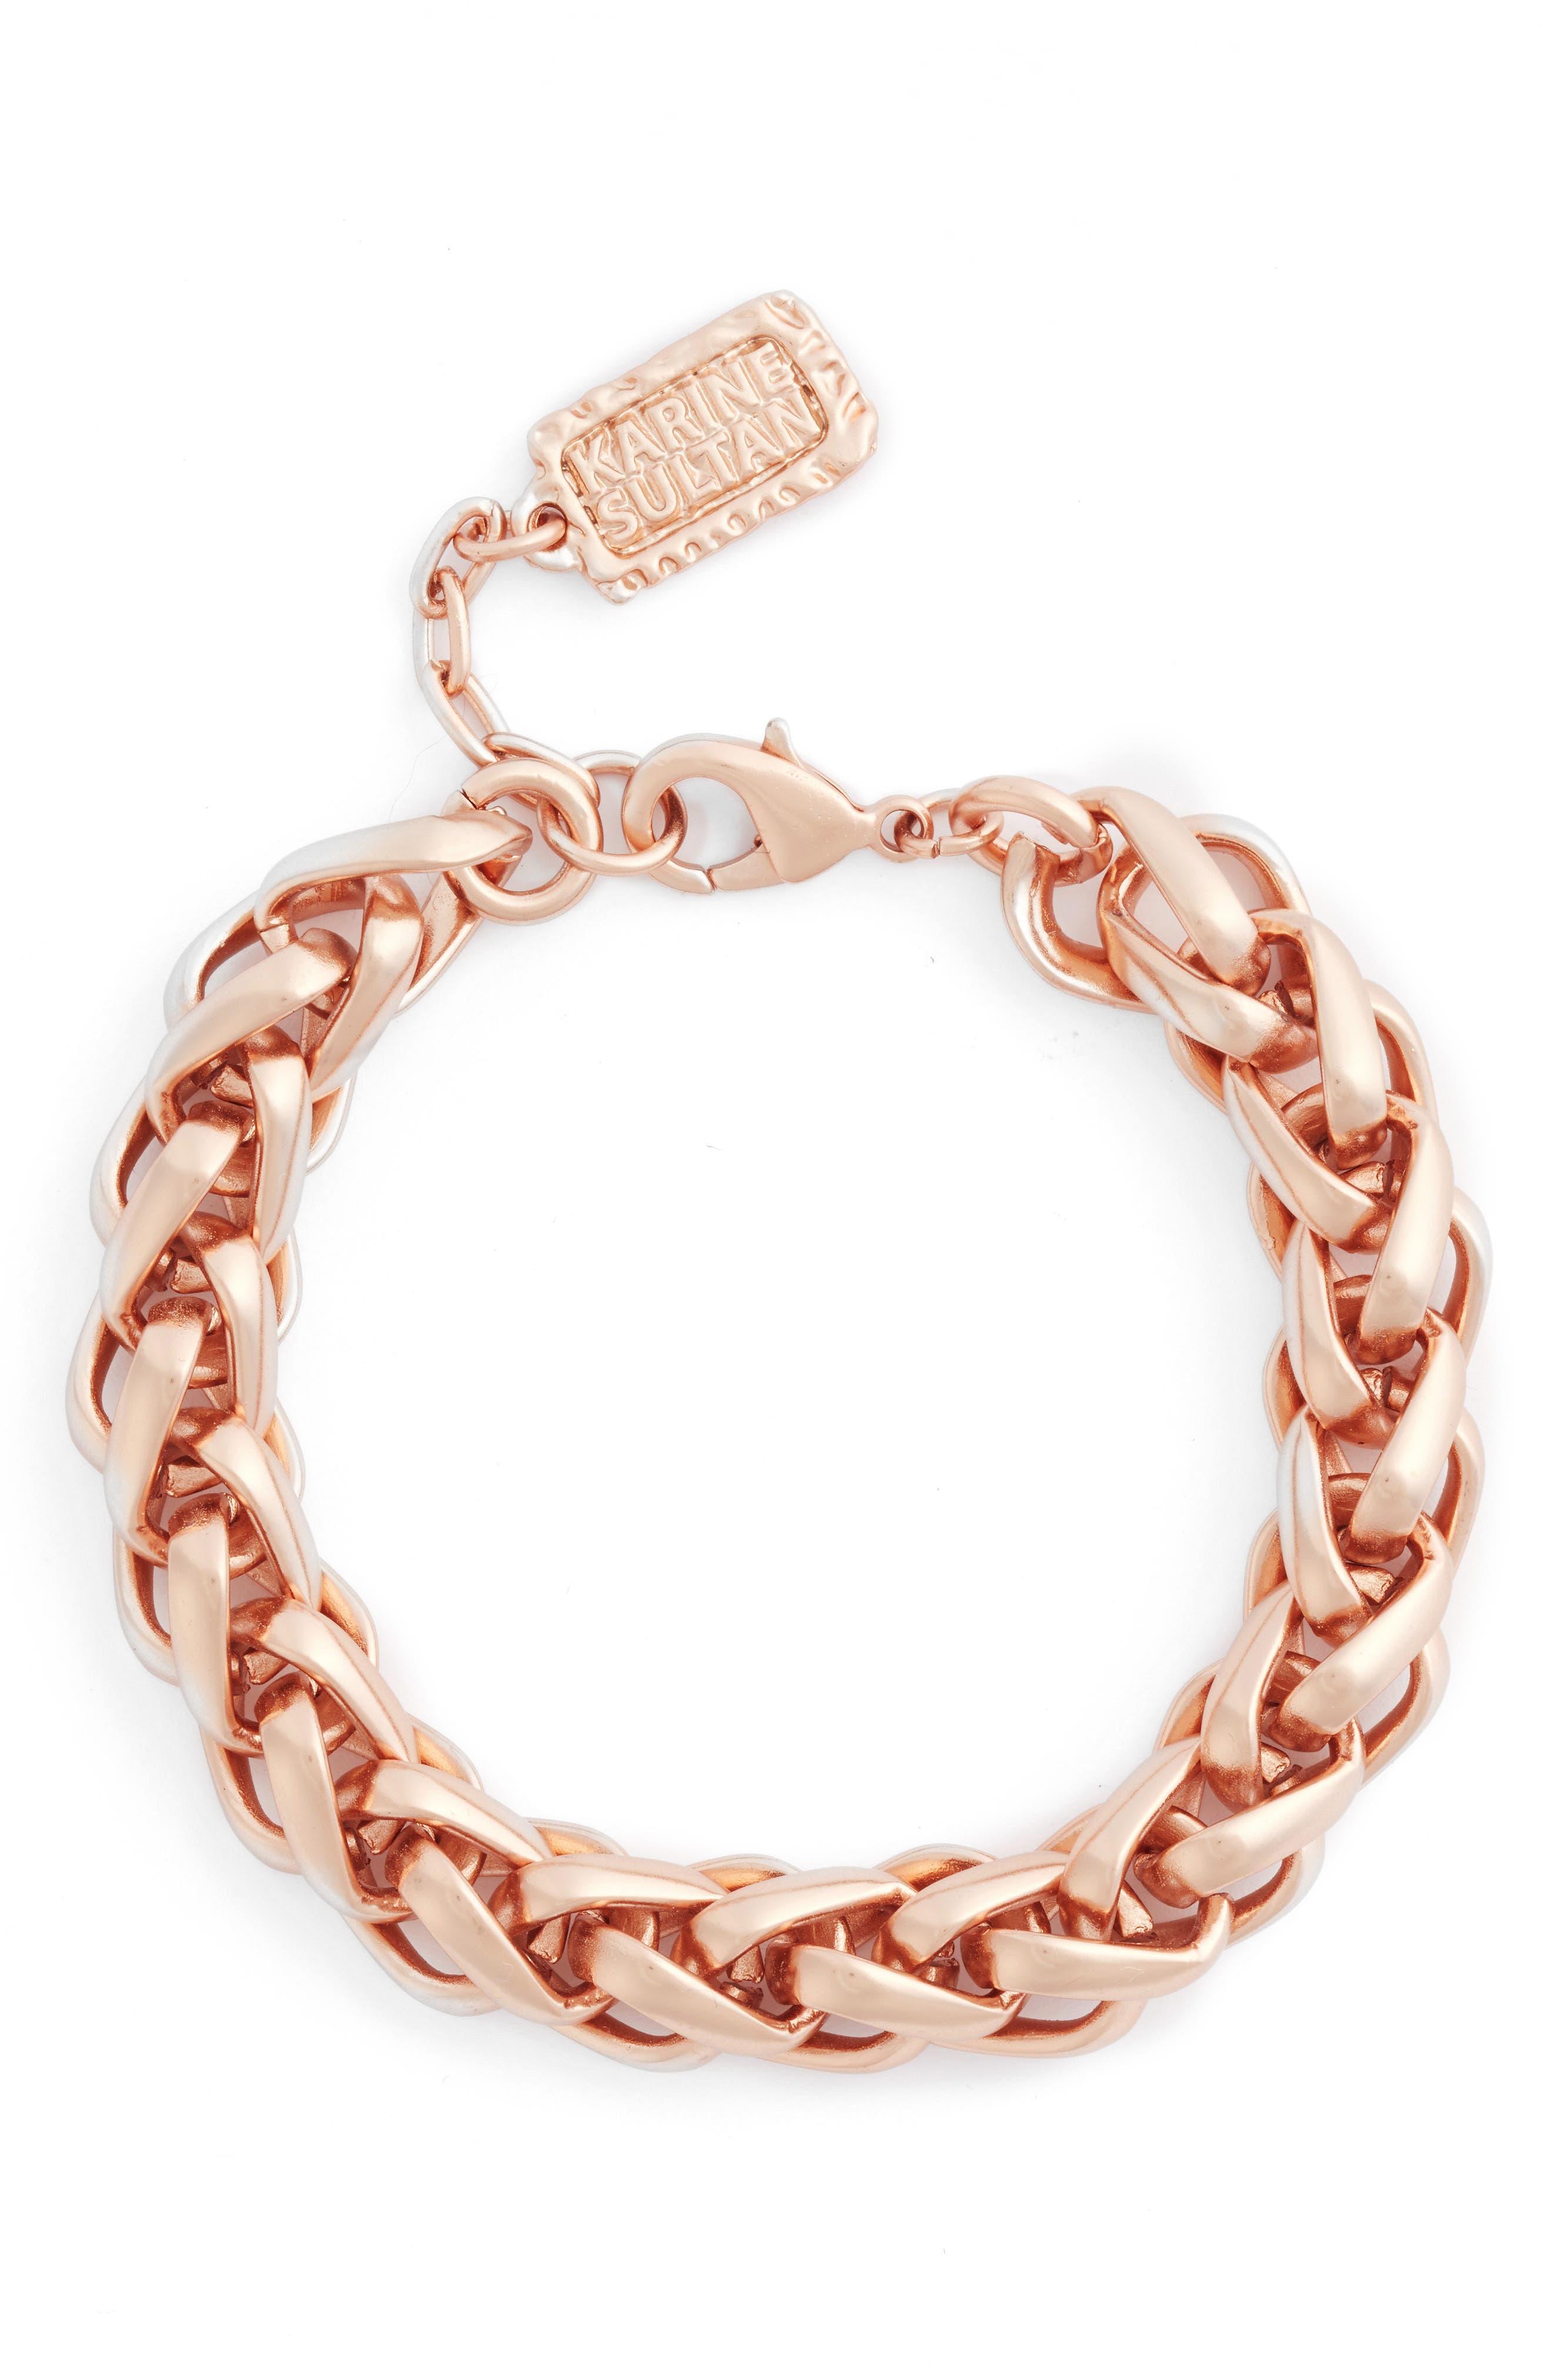 Braided Link Bracelet,                             Main thumbnail 1, color,                             ROSE GOLD